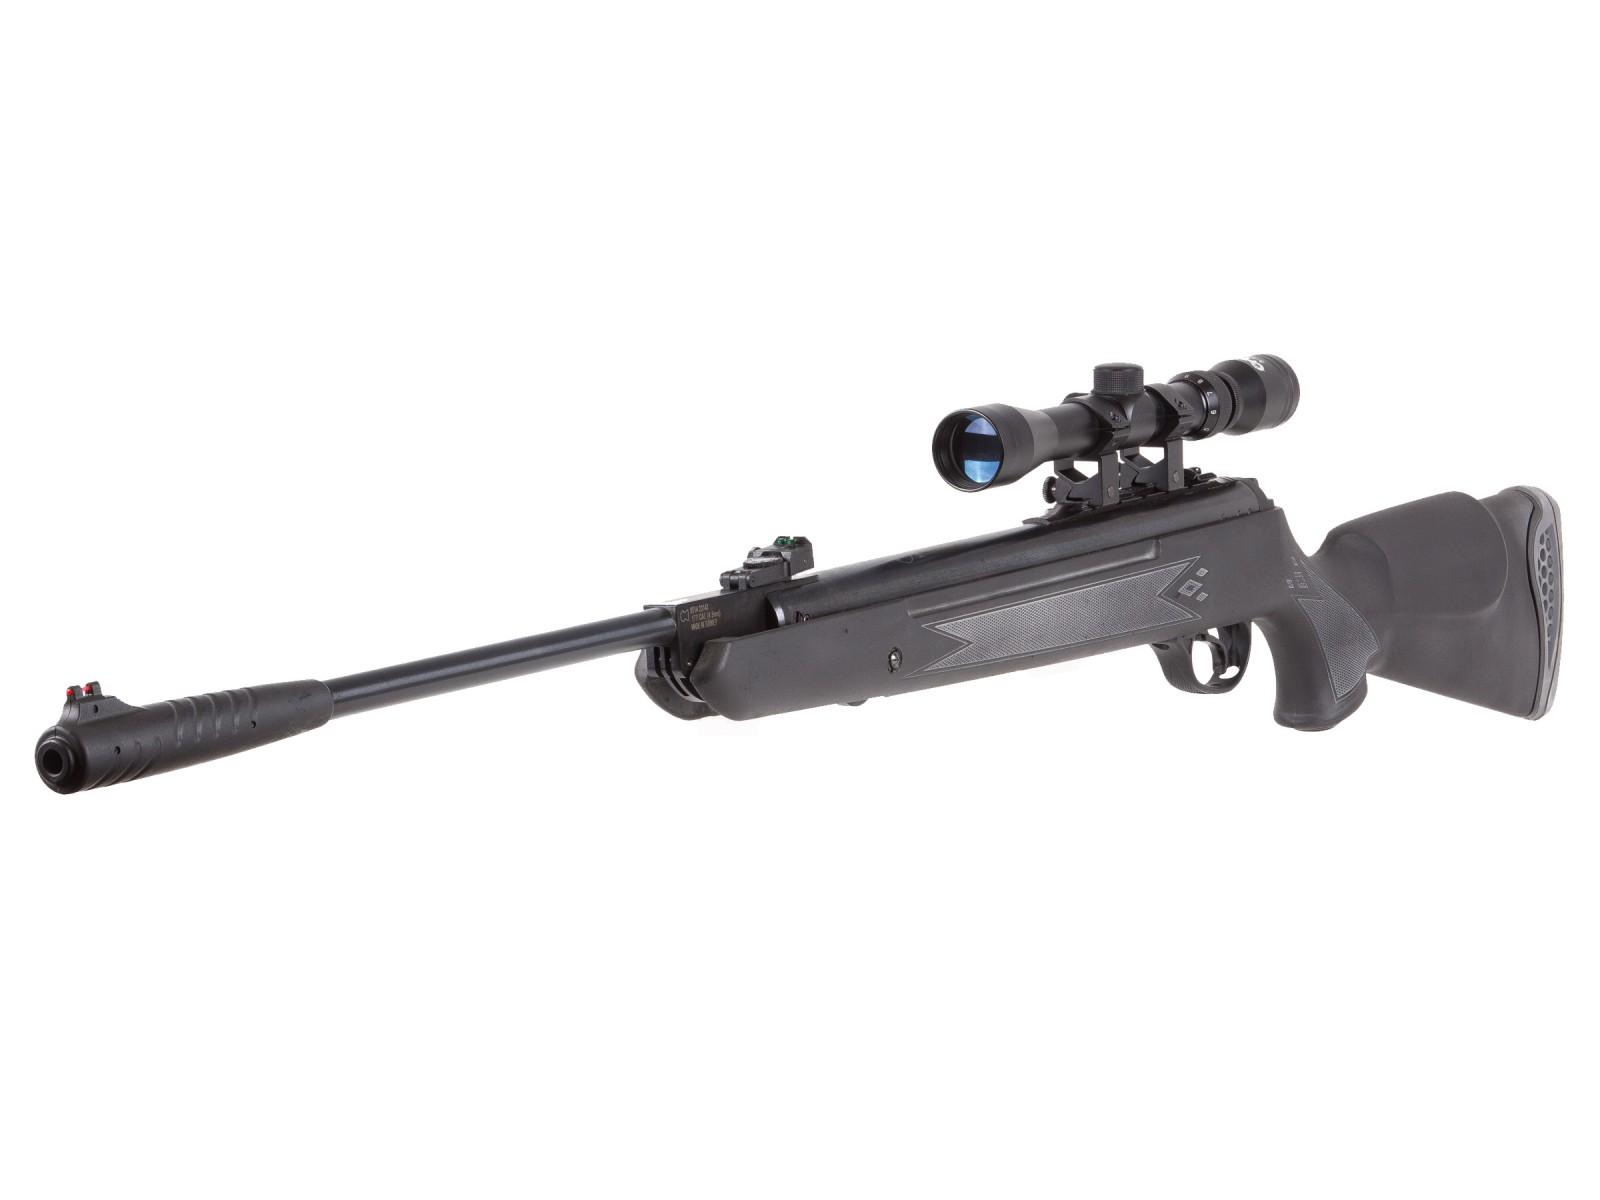 Hatsan 125 Air Rifle, Black Stock, Vortex Piston